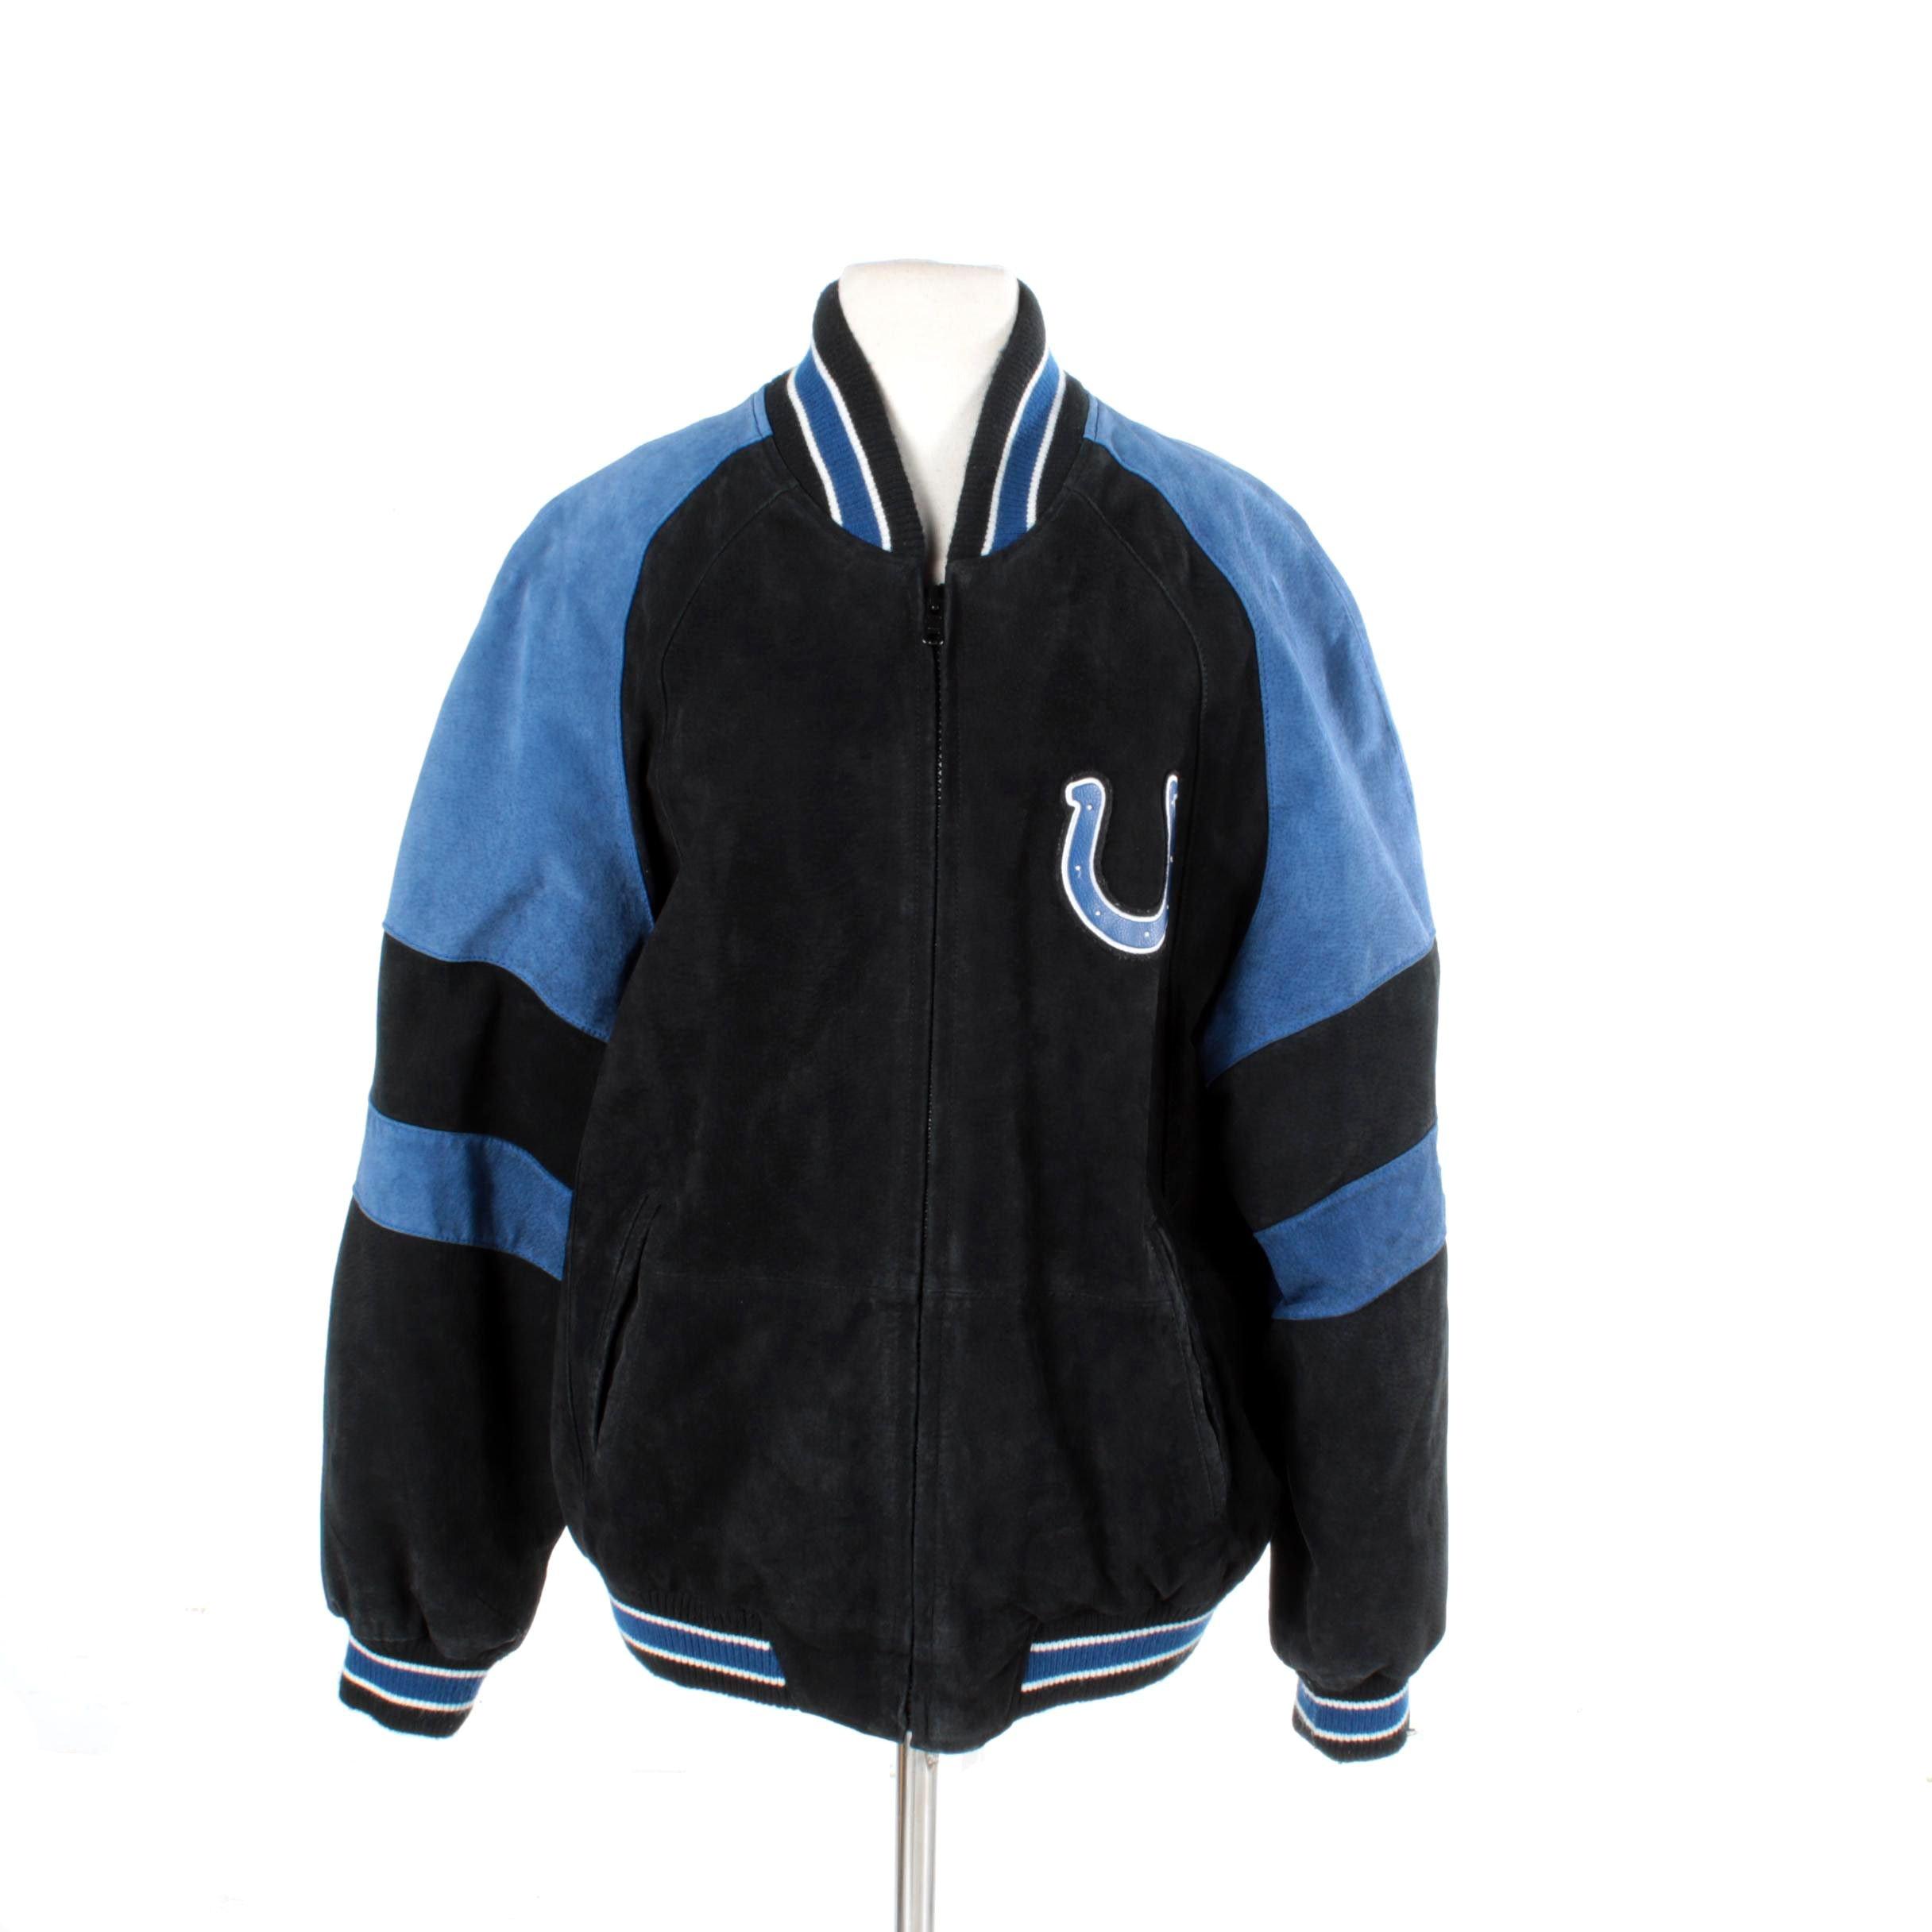 Men's NFL Indianapolis Colts Suede Varsity Jacket